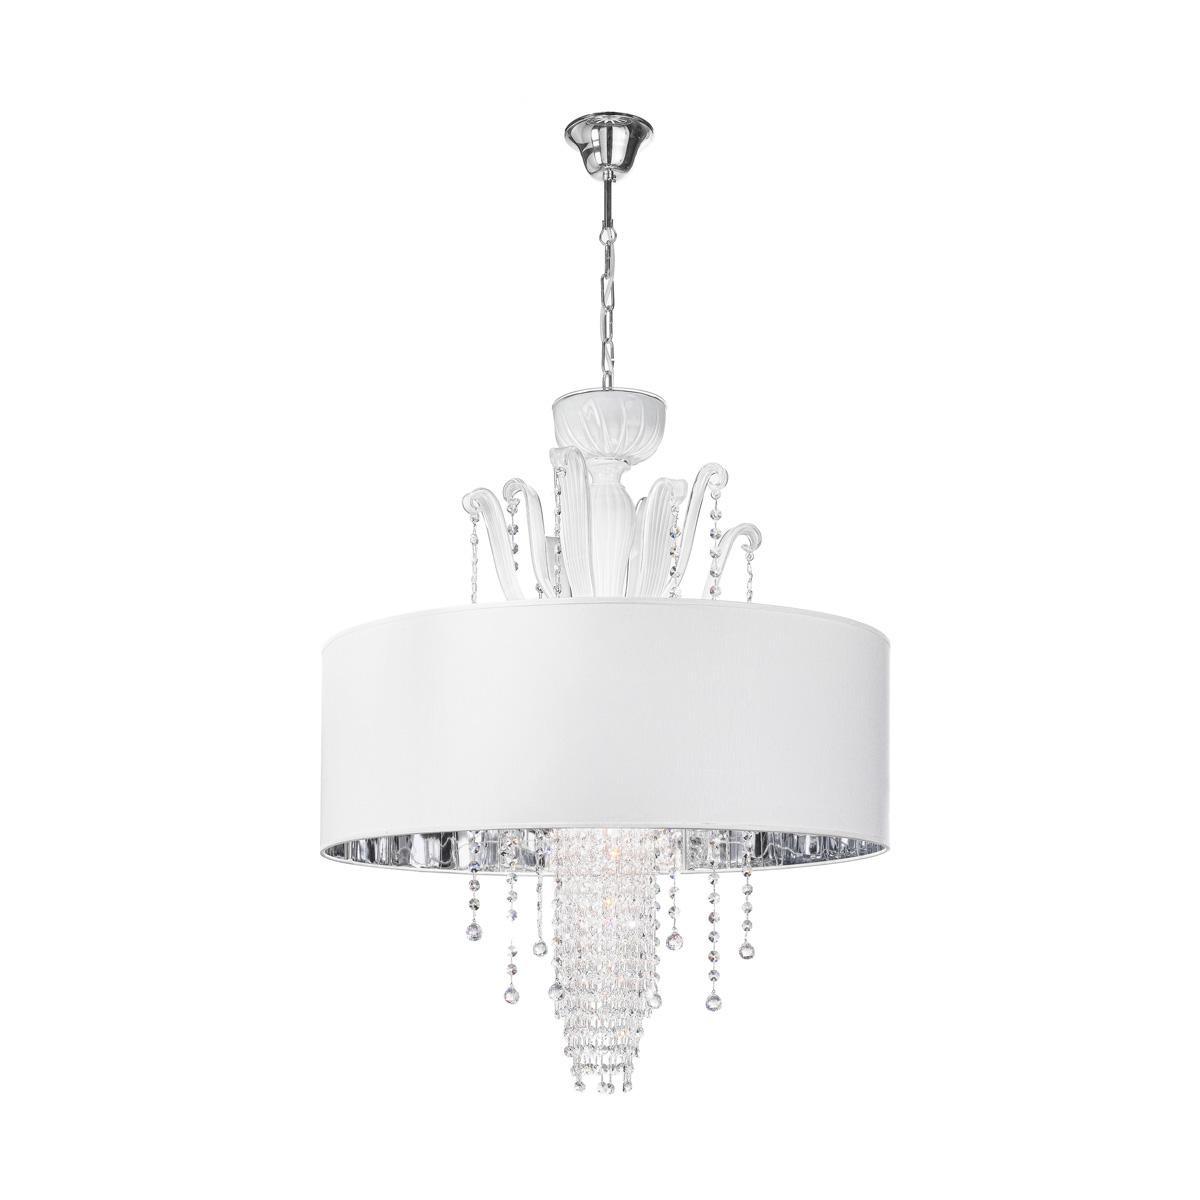 """Innocenza"" Murano glass pendant light - 6 lights - white"